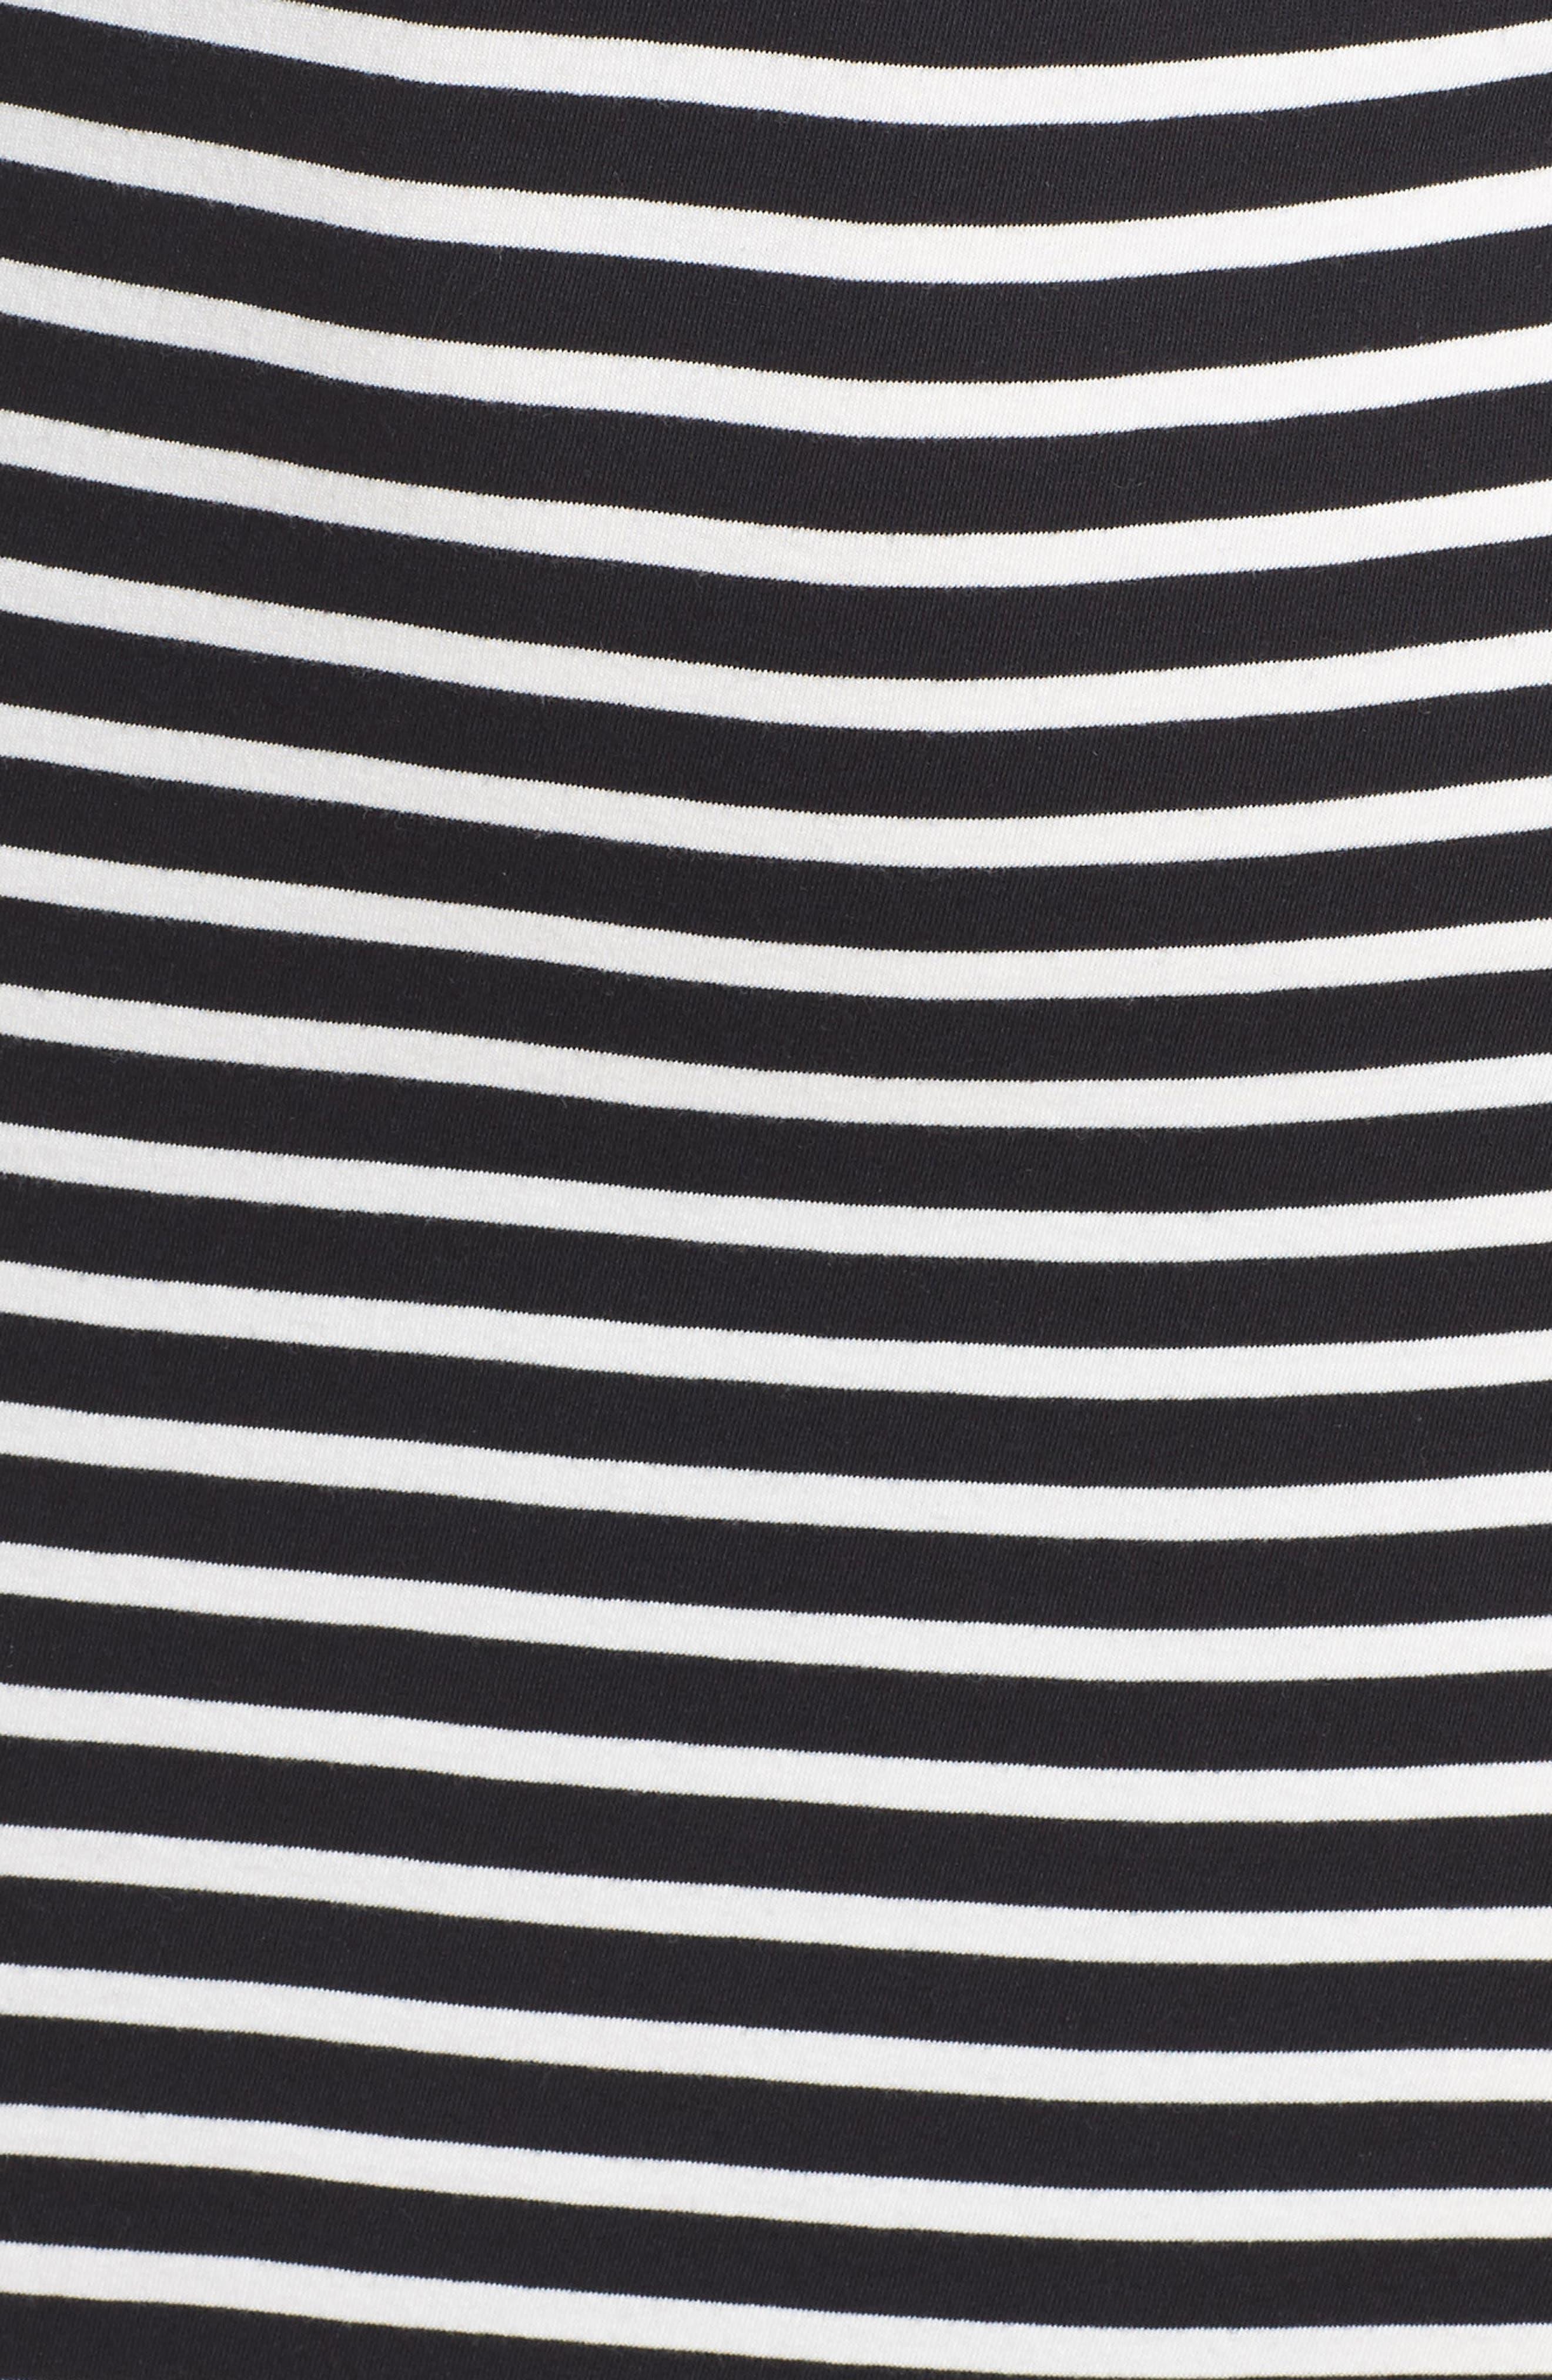 Solana Stripe Knit Midi Dress,                             Alternate thumbnail 5, color,                             Black White Stripe